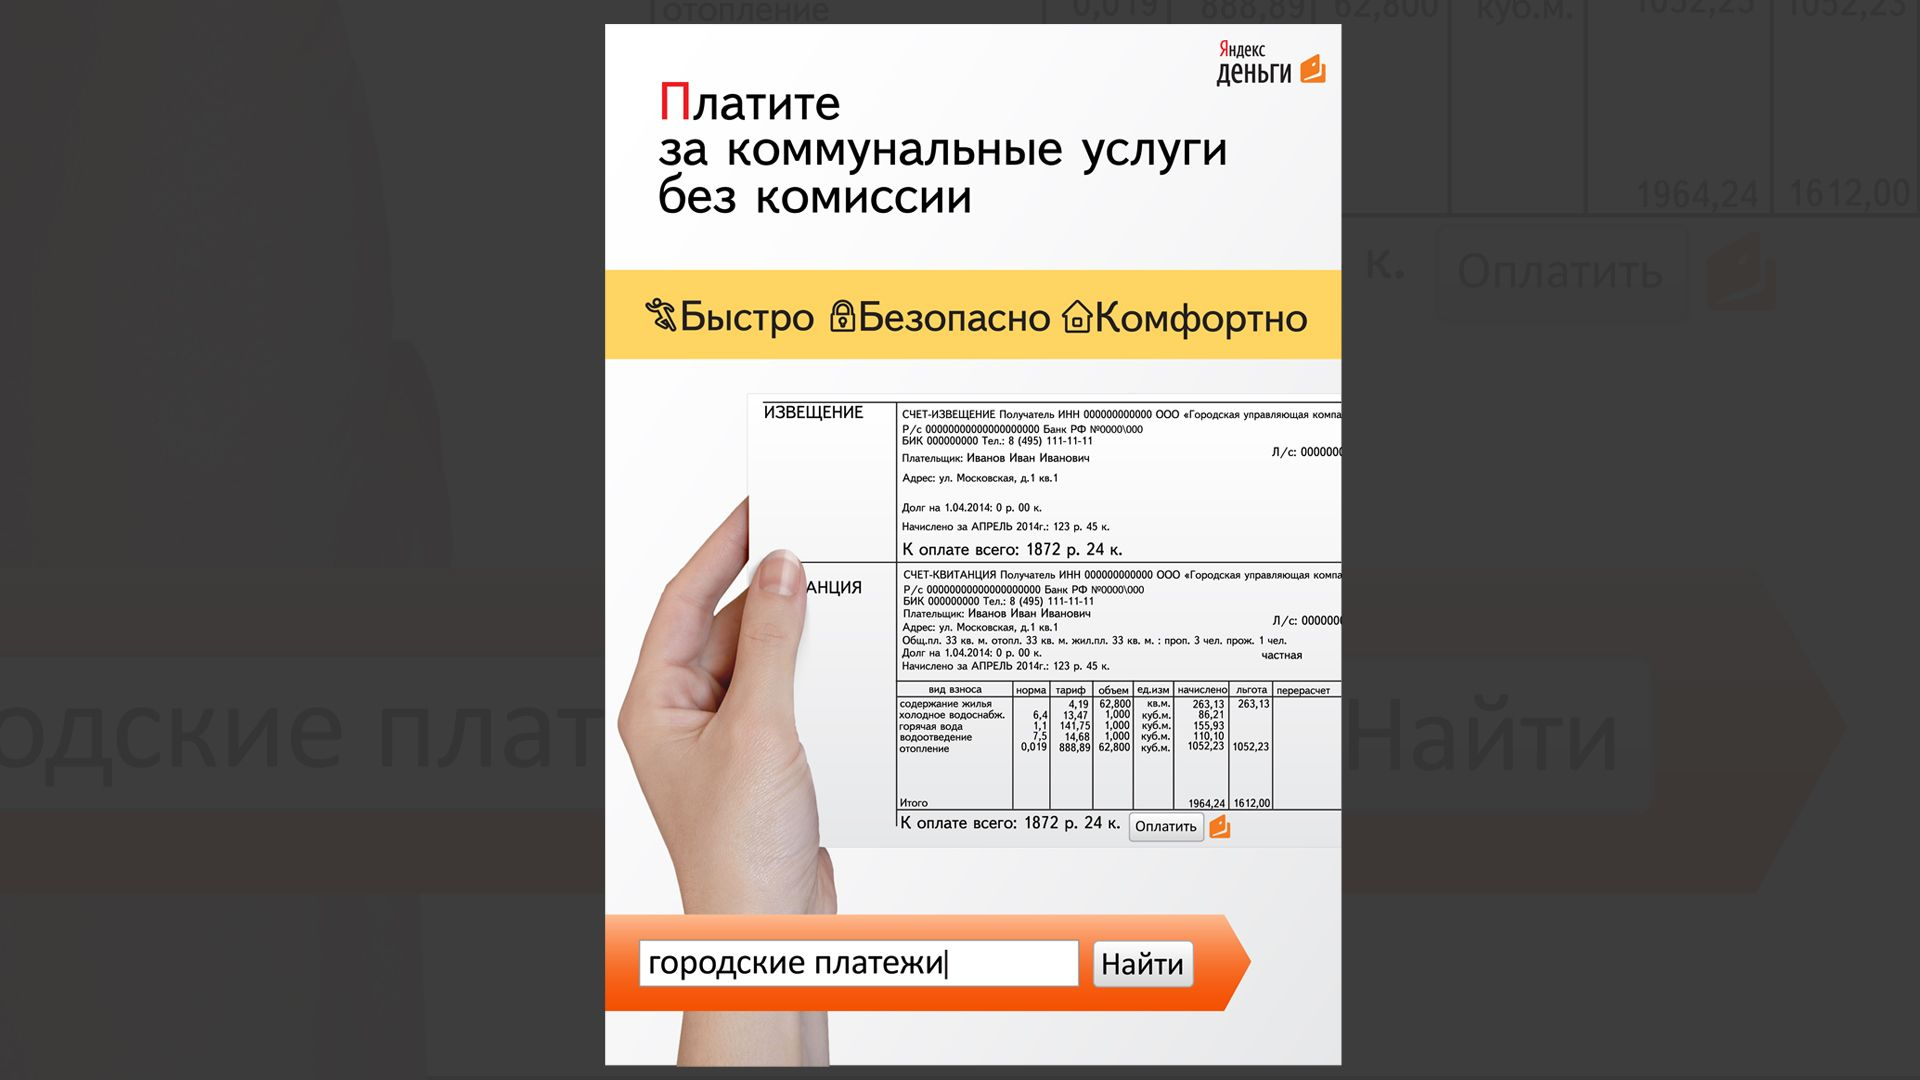 Реклама Яндекс.Денег для оплаты ЖКХ - дизайнер drawmedead